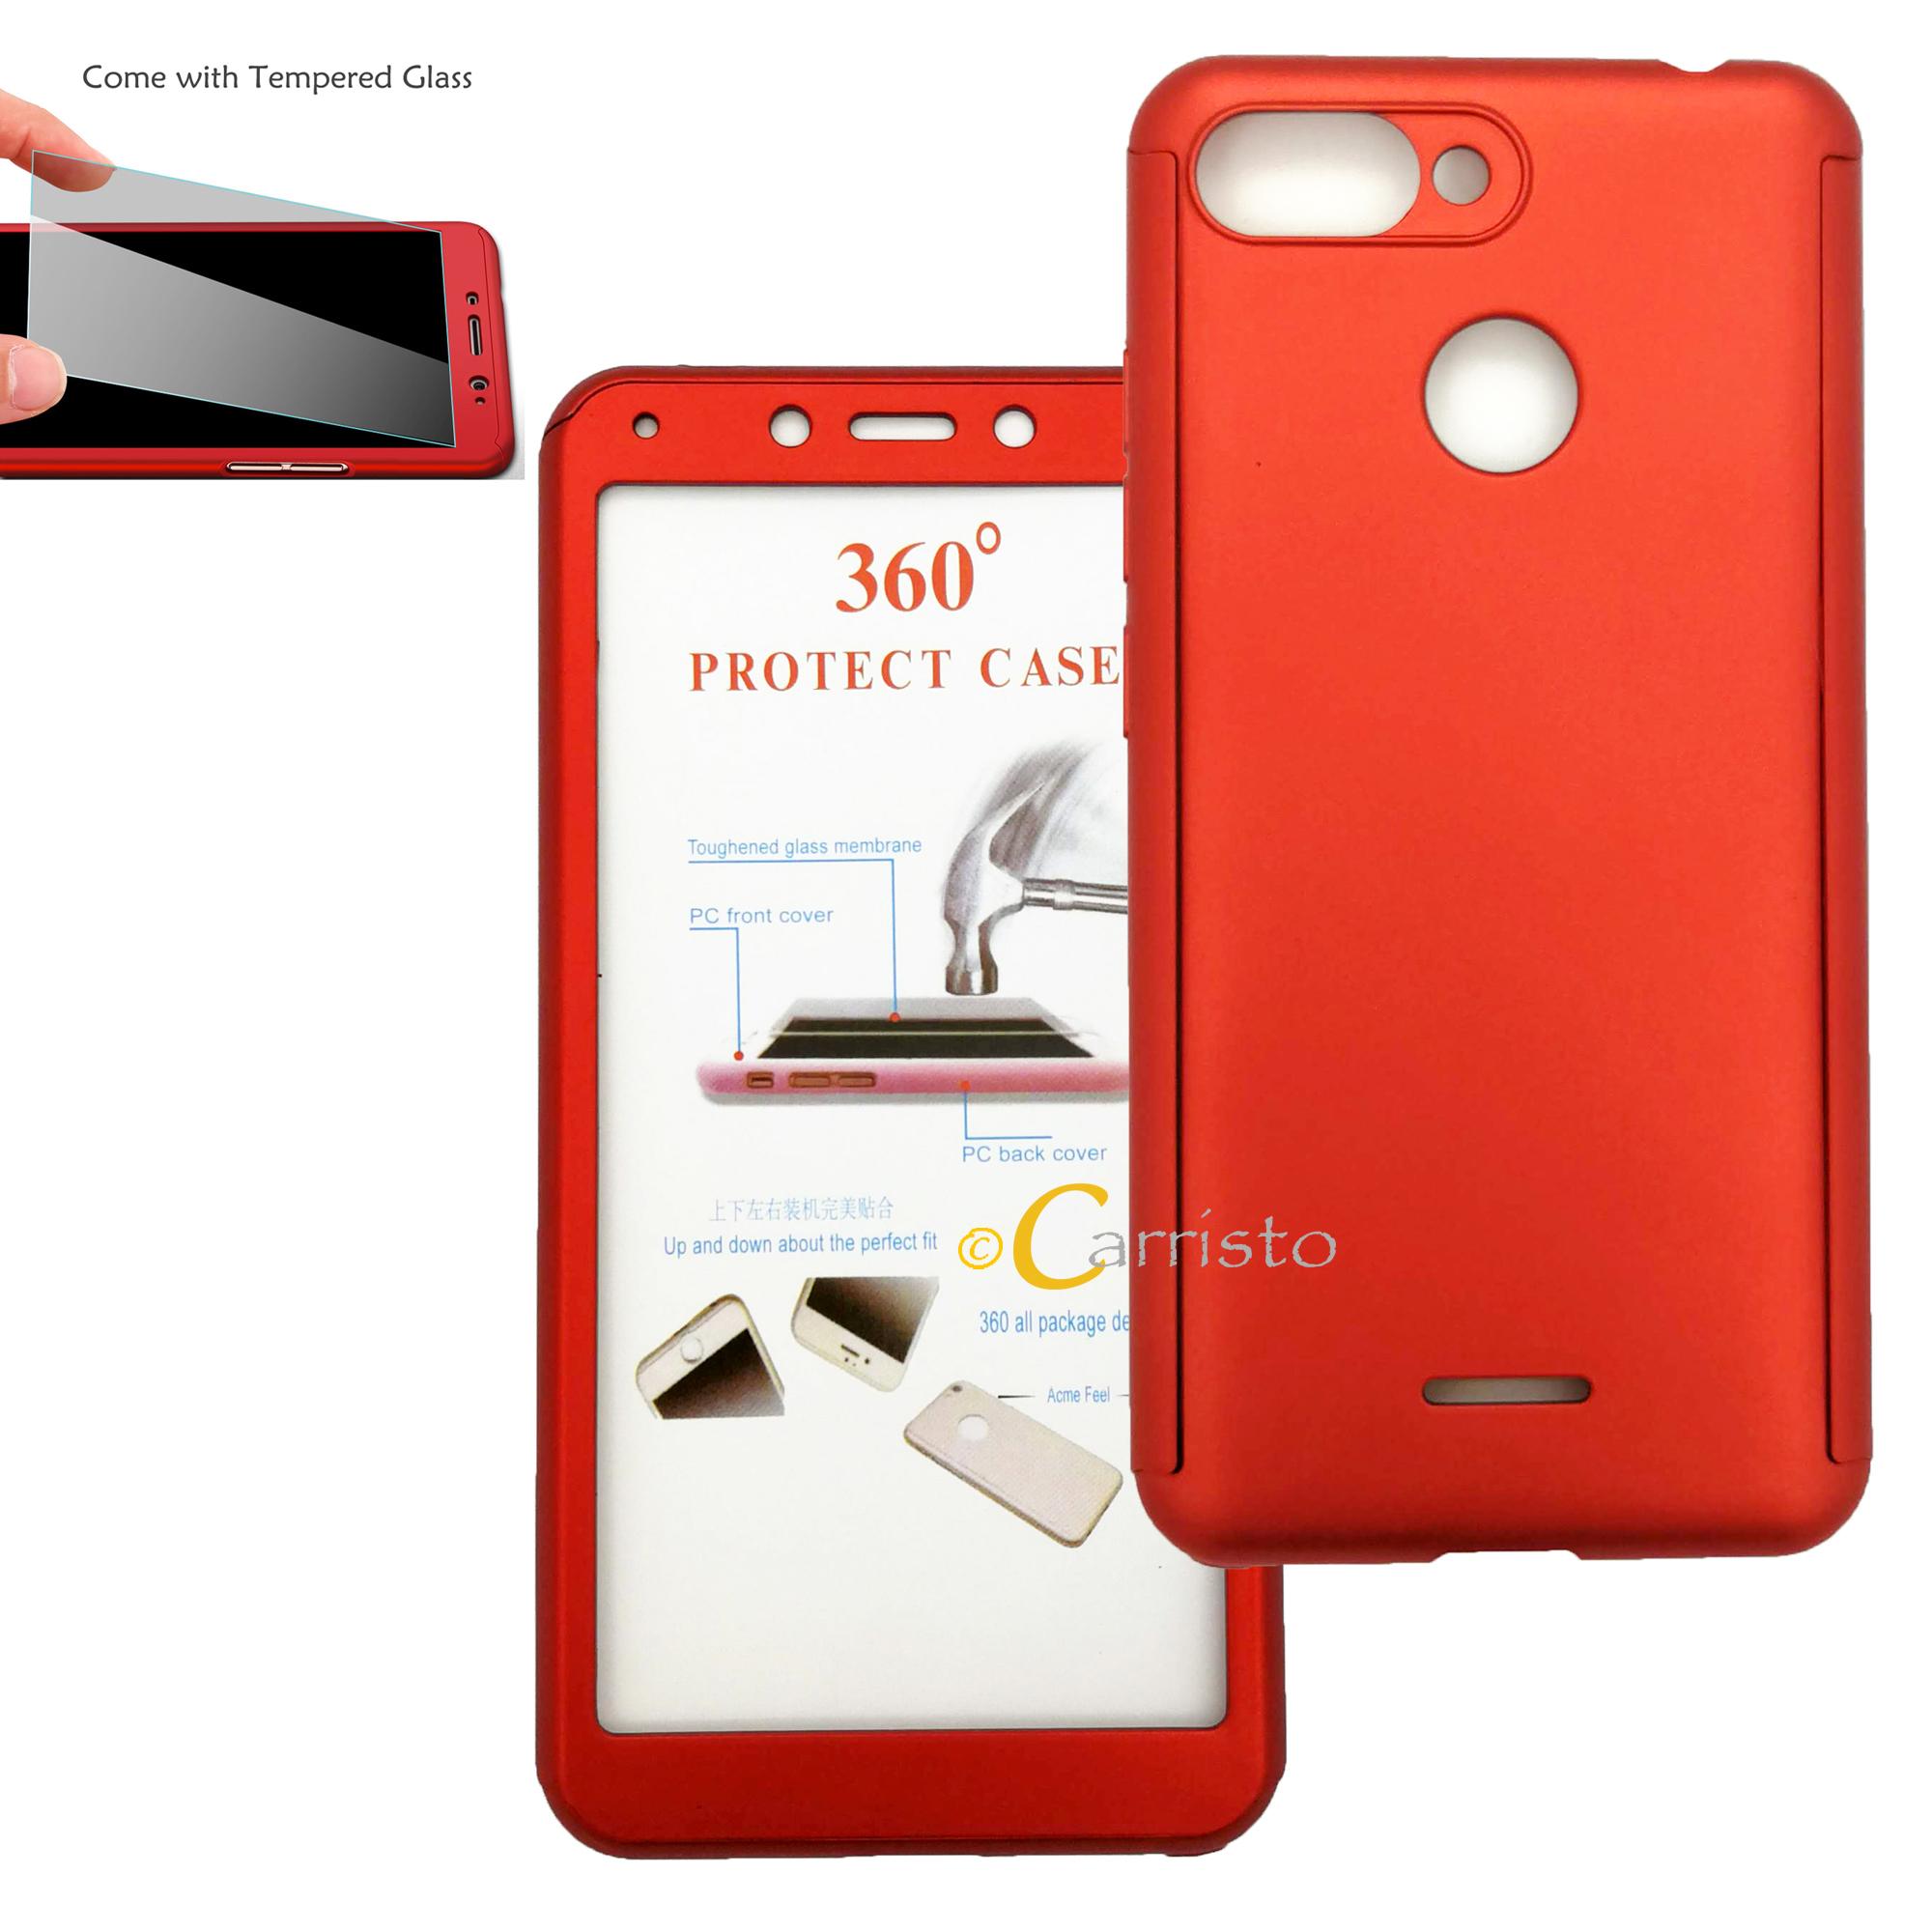 hot sale online 6e208 5404b Xiaomi Redmi 5 Plus Redmi 6 360 Degree Full Cover Case With Tempered G